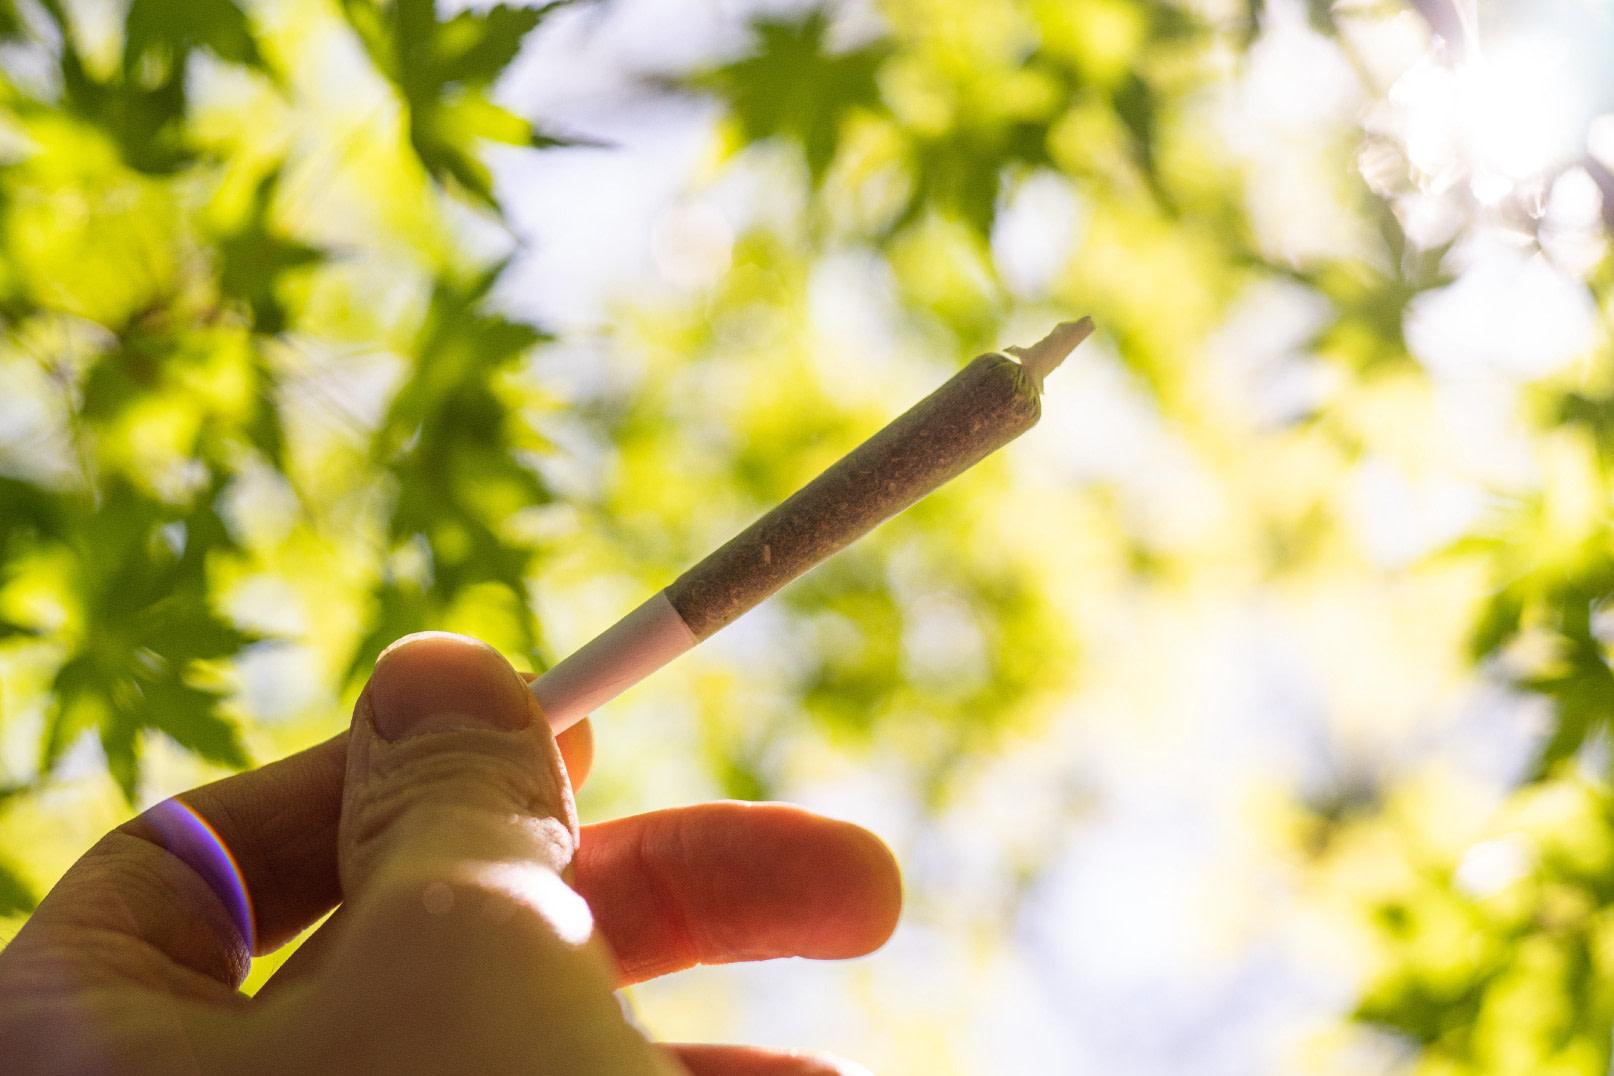 The Top 4 Benefits of Smoking CBD Flower